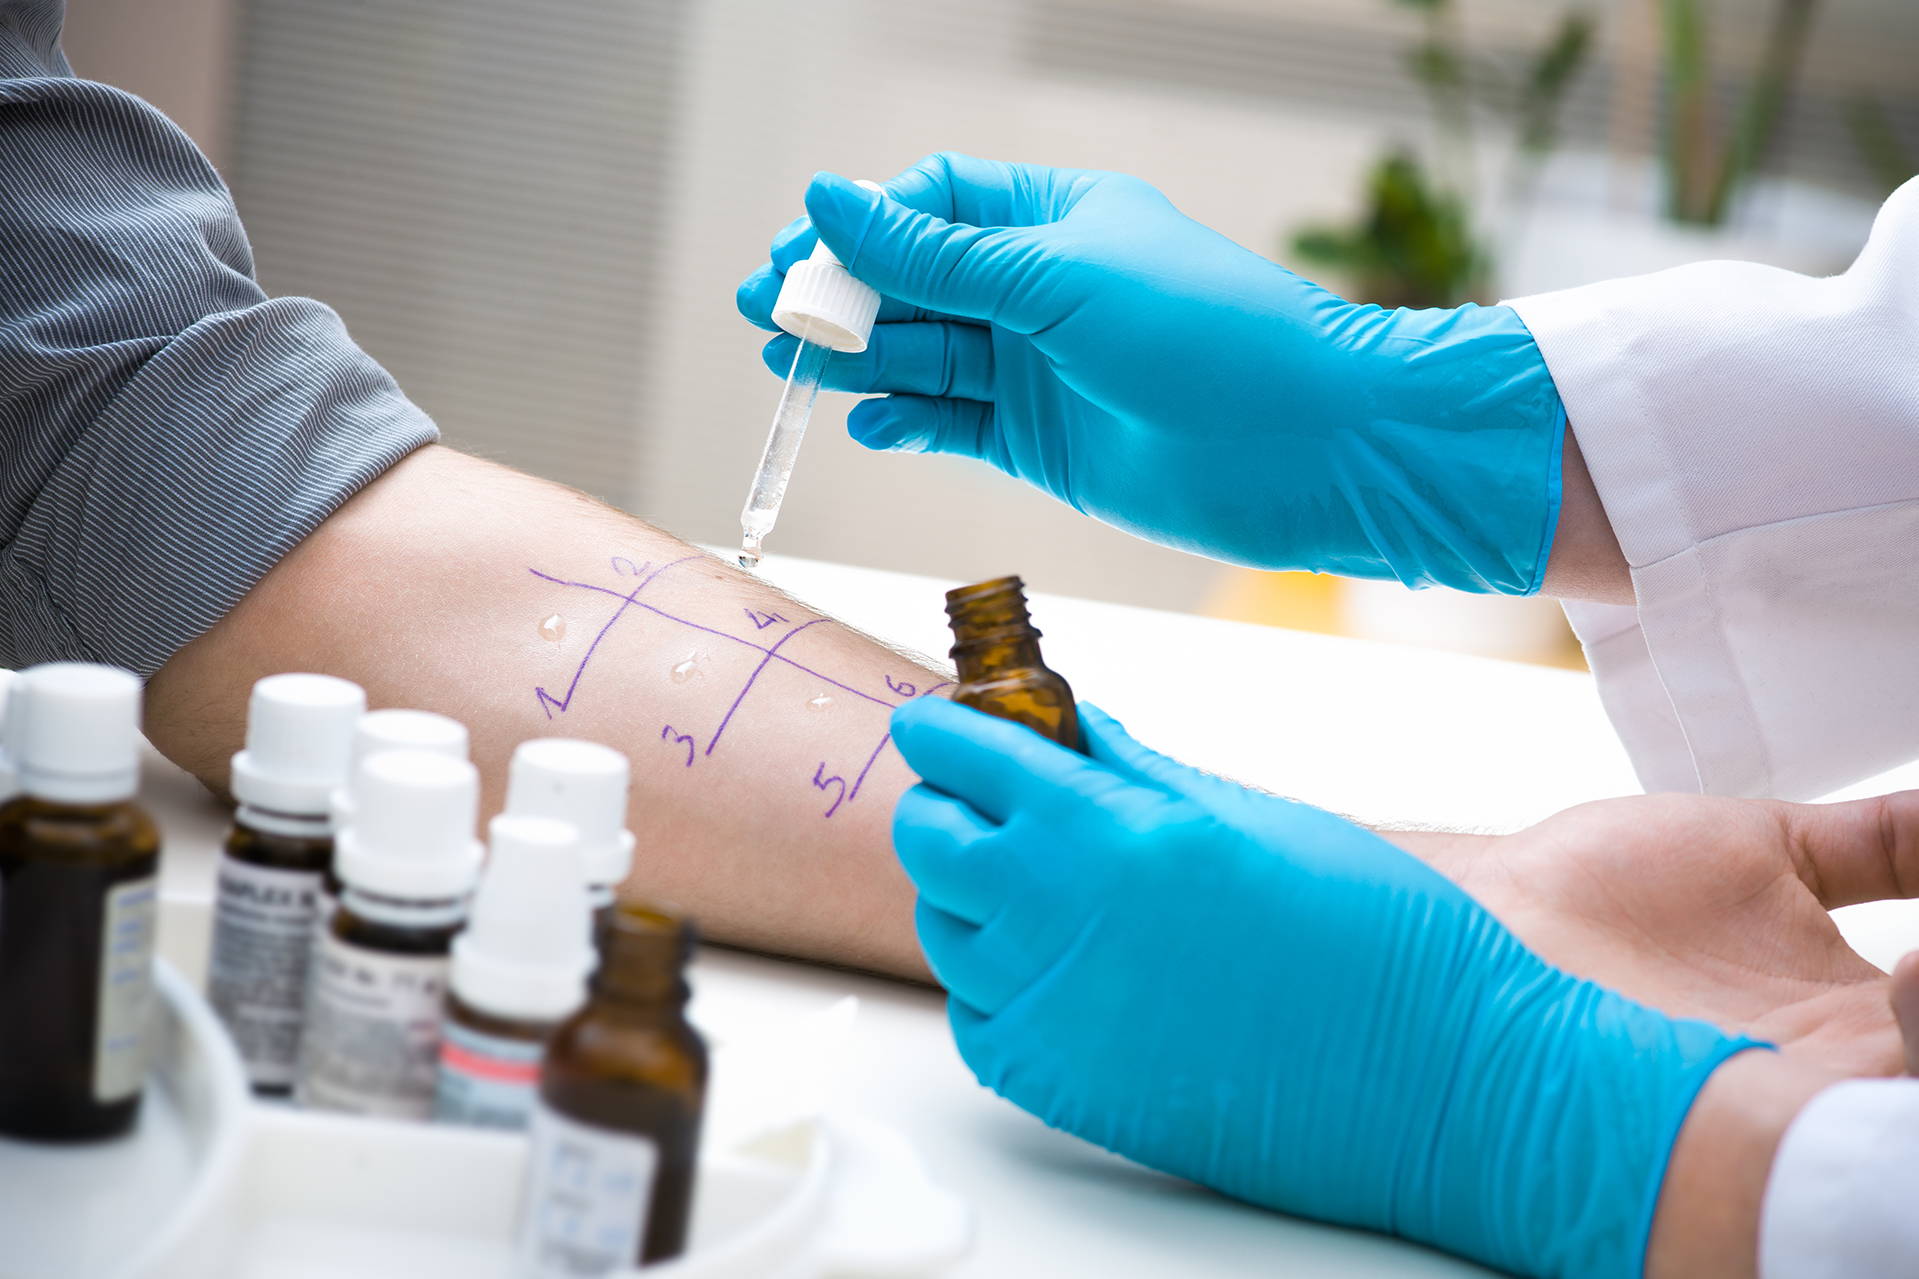 L.A.M. Poliambulatorio Forlì esami test allergie